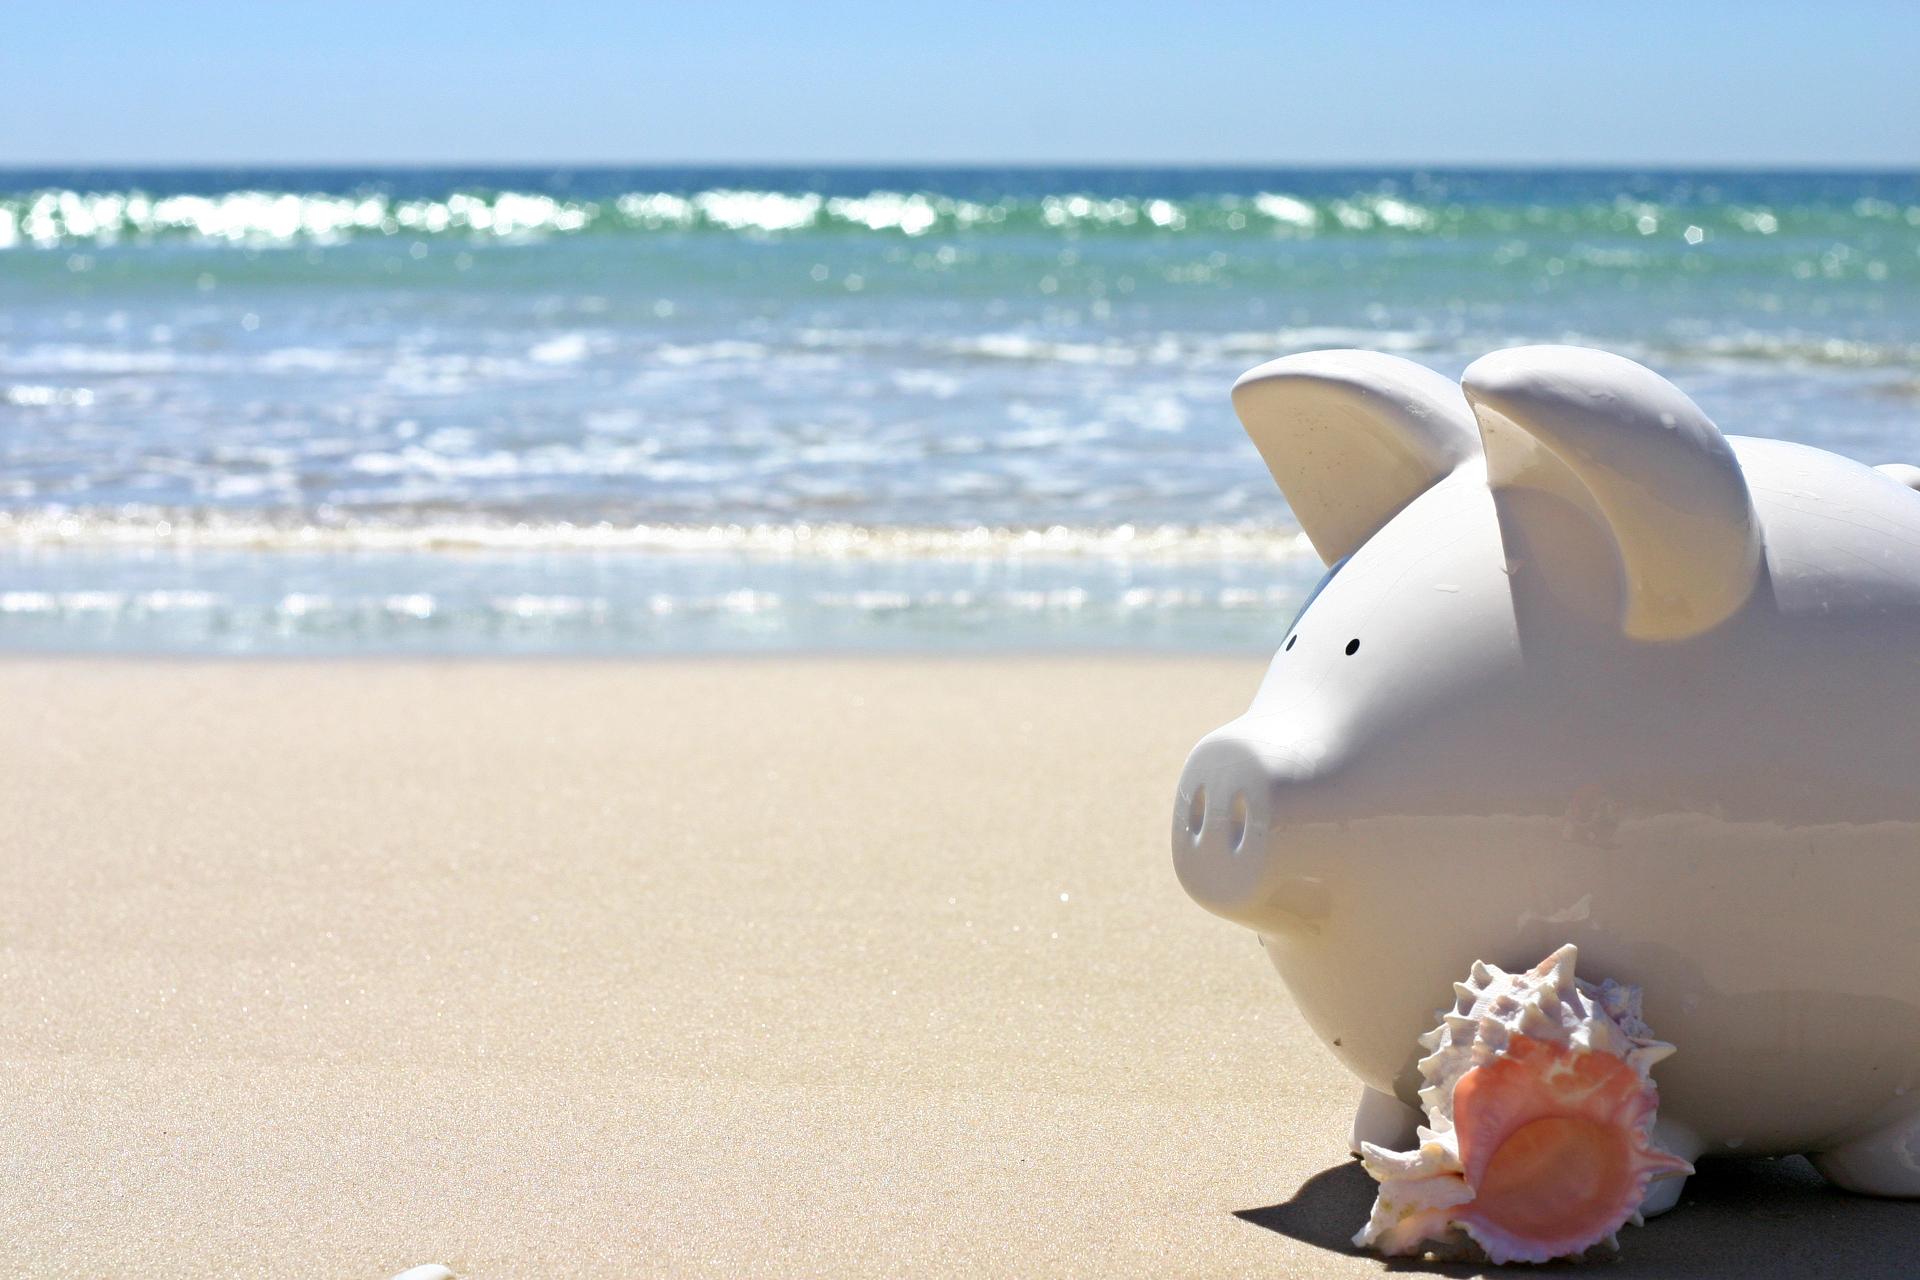 Piggybank on the beach